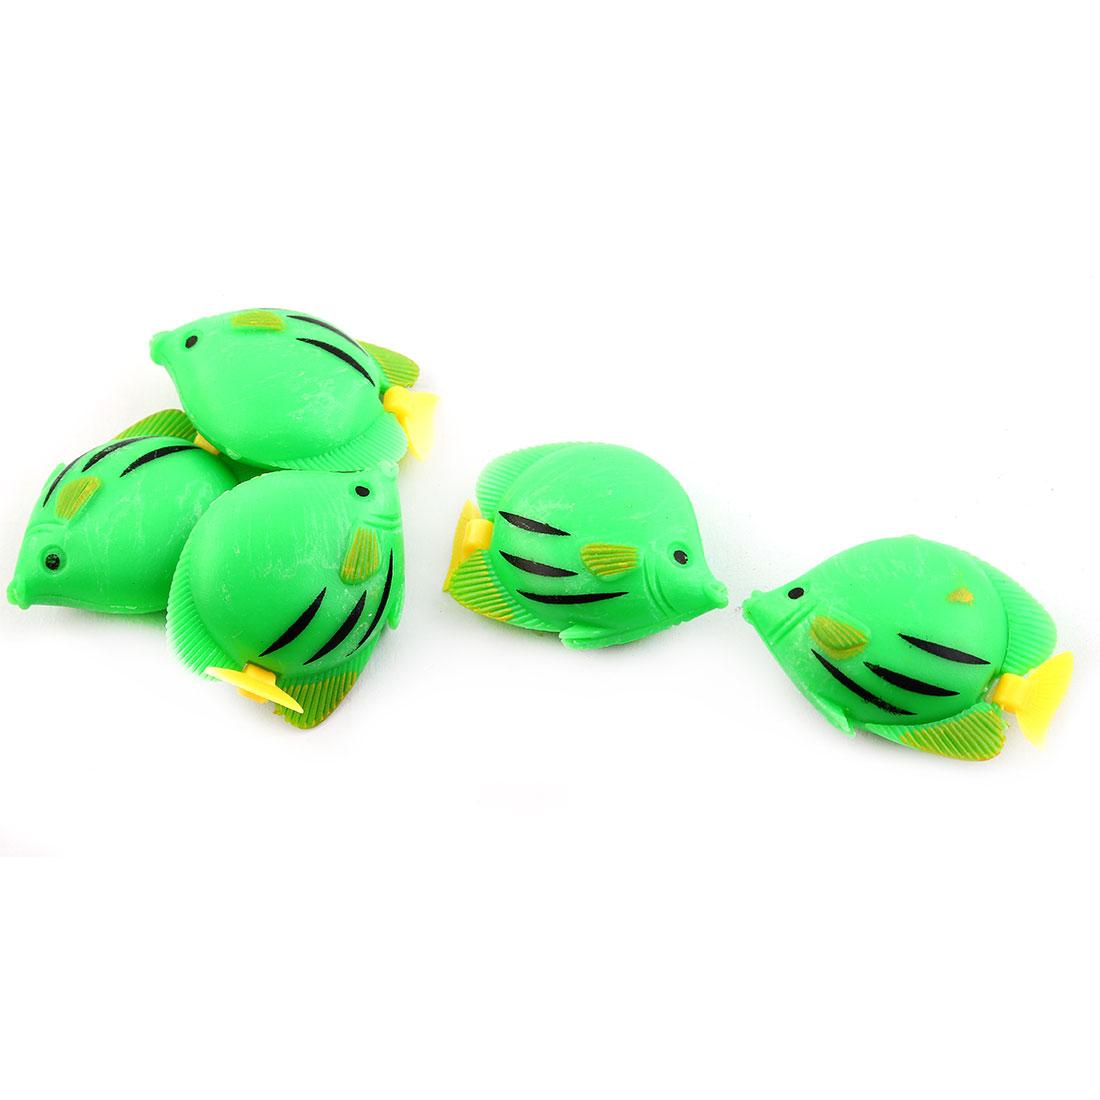 Aquarium Mini Plastic Manmade Swing Tail Floating Fish Ornament Green 5pcs